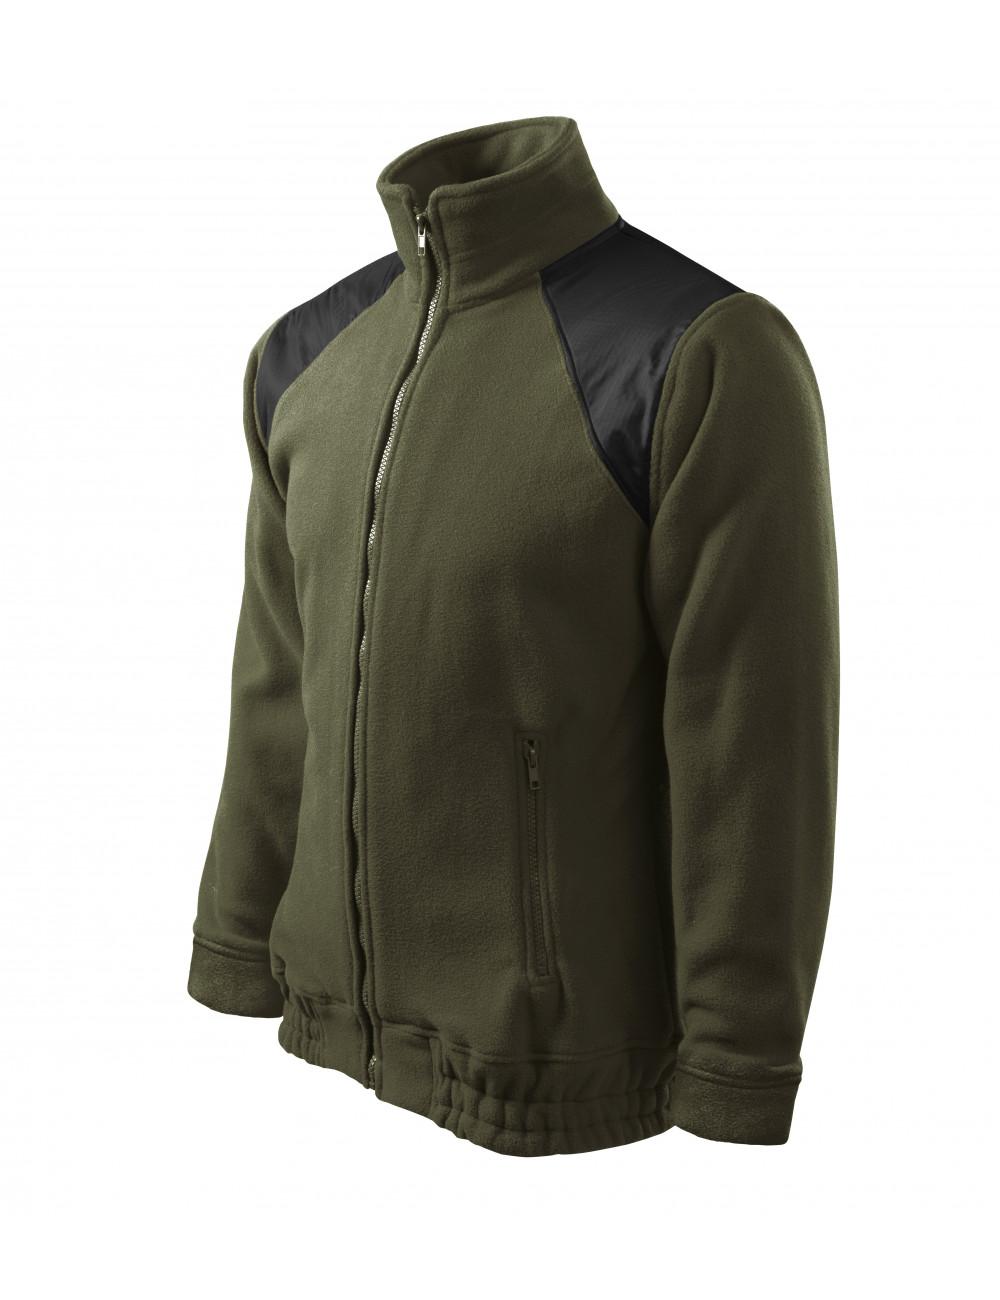 Adler RIMECK Polar unisex Jacket Hi-Q 506 military